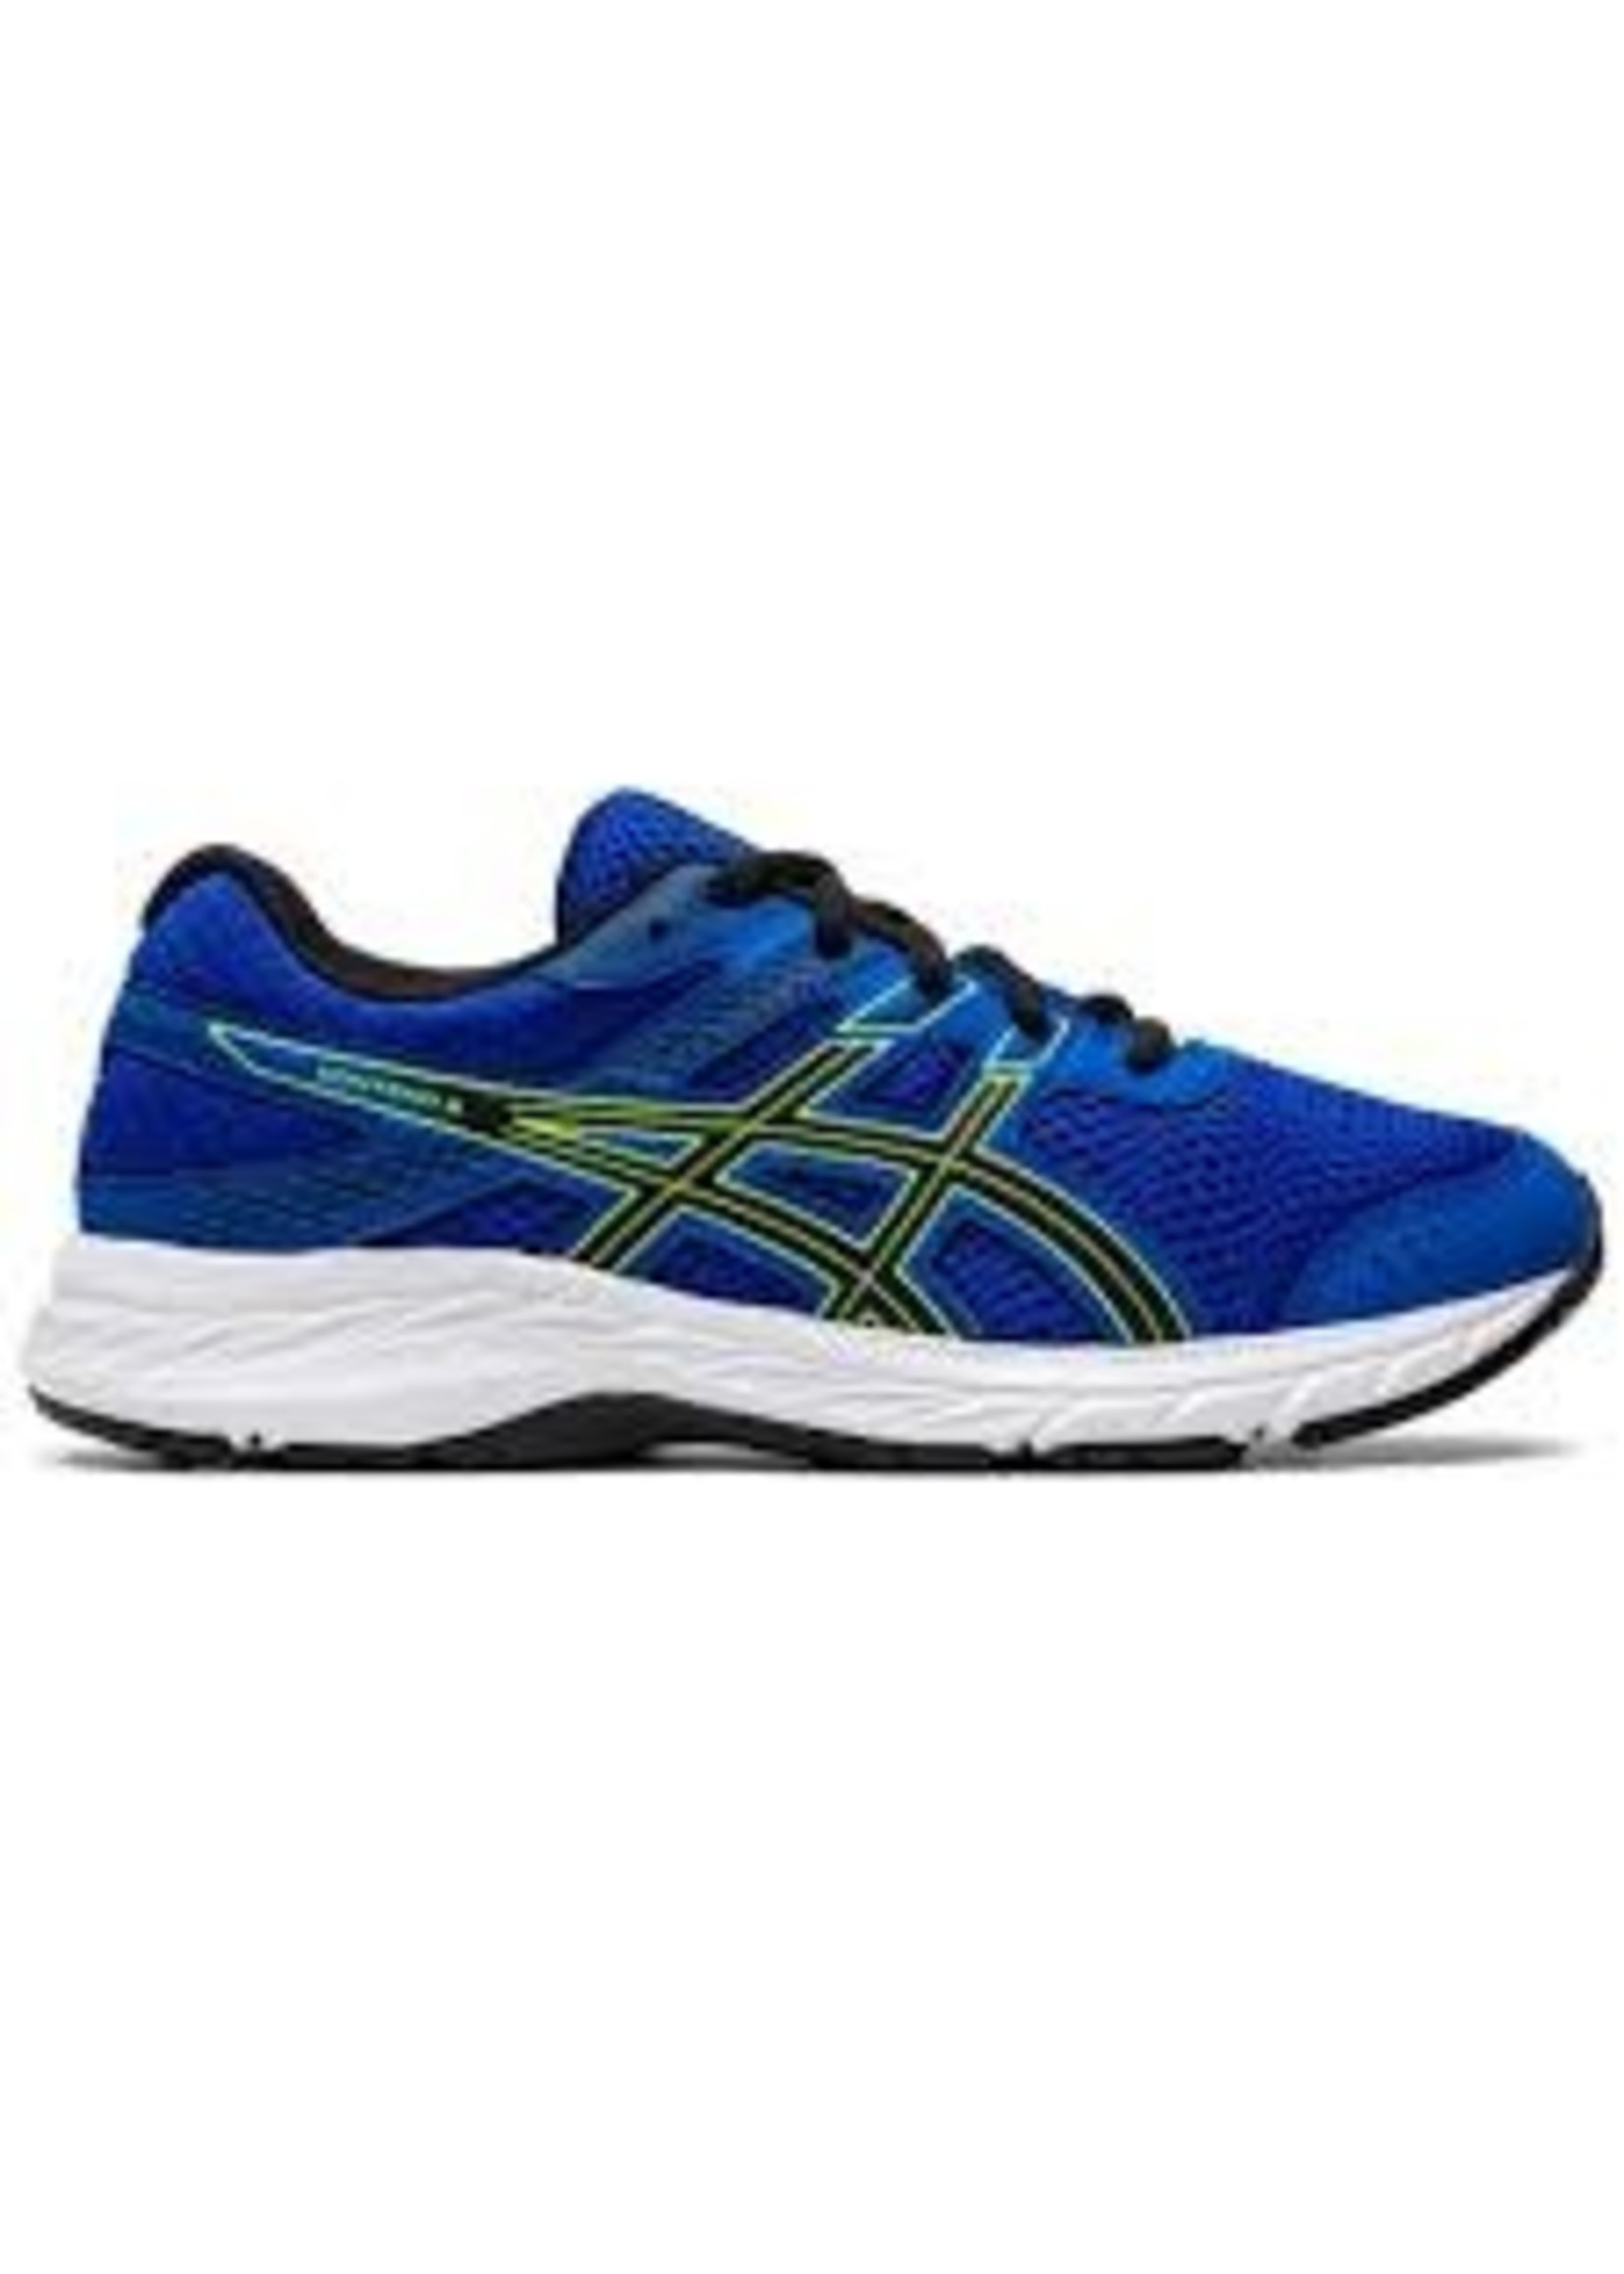 Asics Asics Contend 6 GS Junior Running Shoe, Tuna Blue/Black